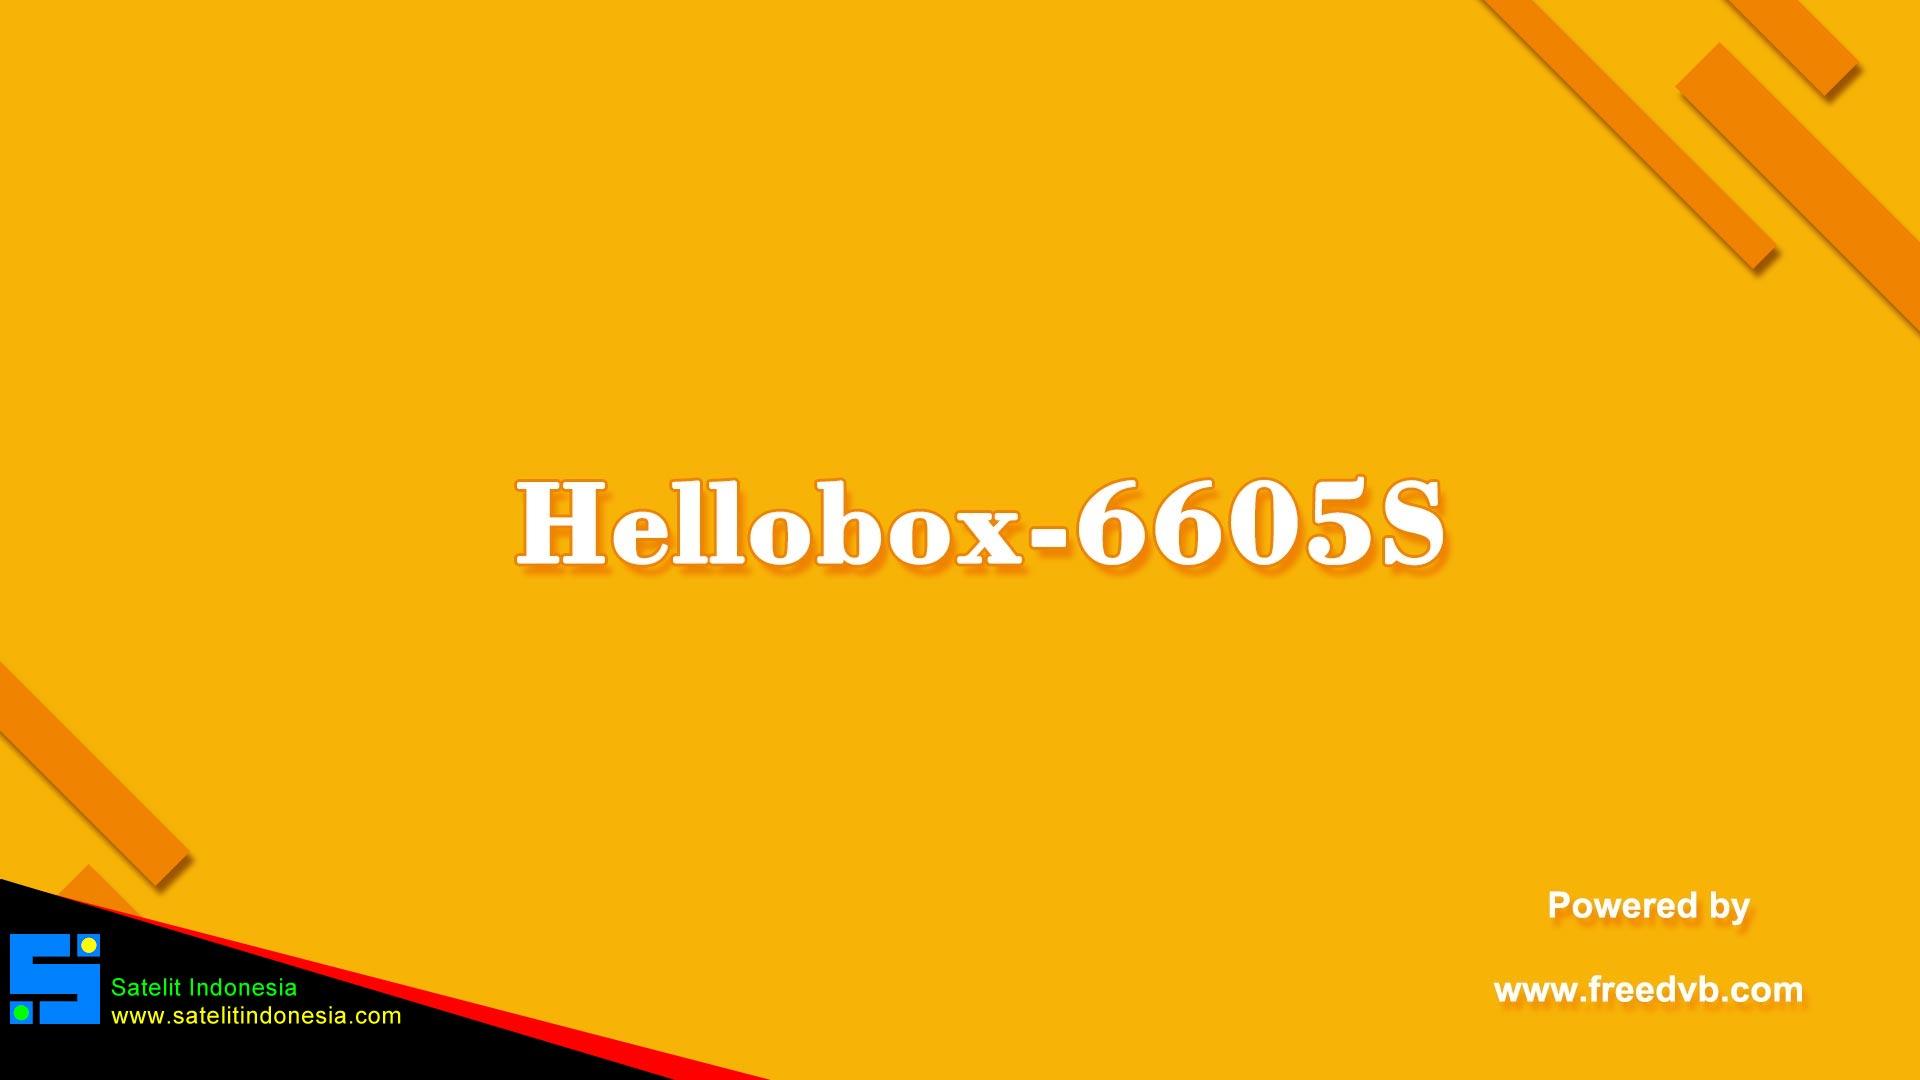 Software Hellobox GX6605S New Update Firmware Receiver